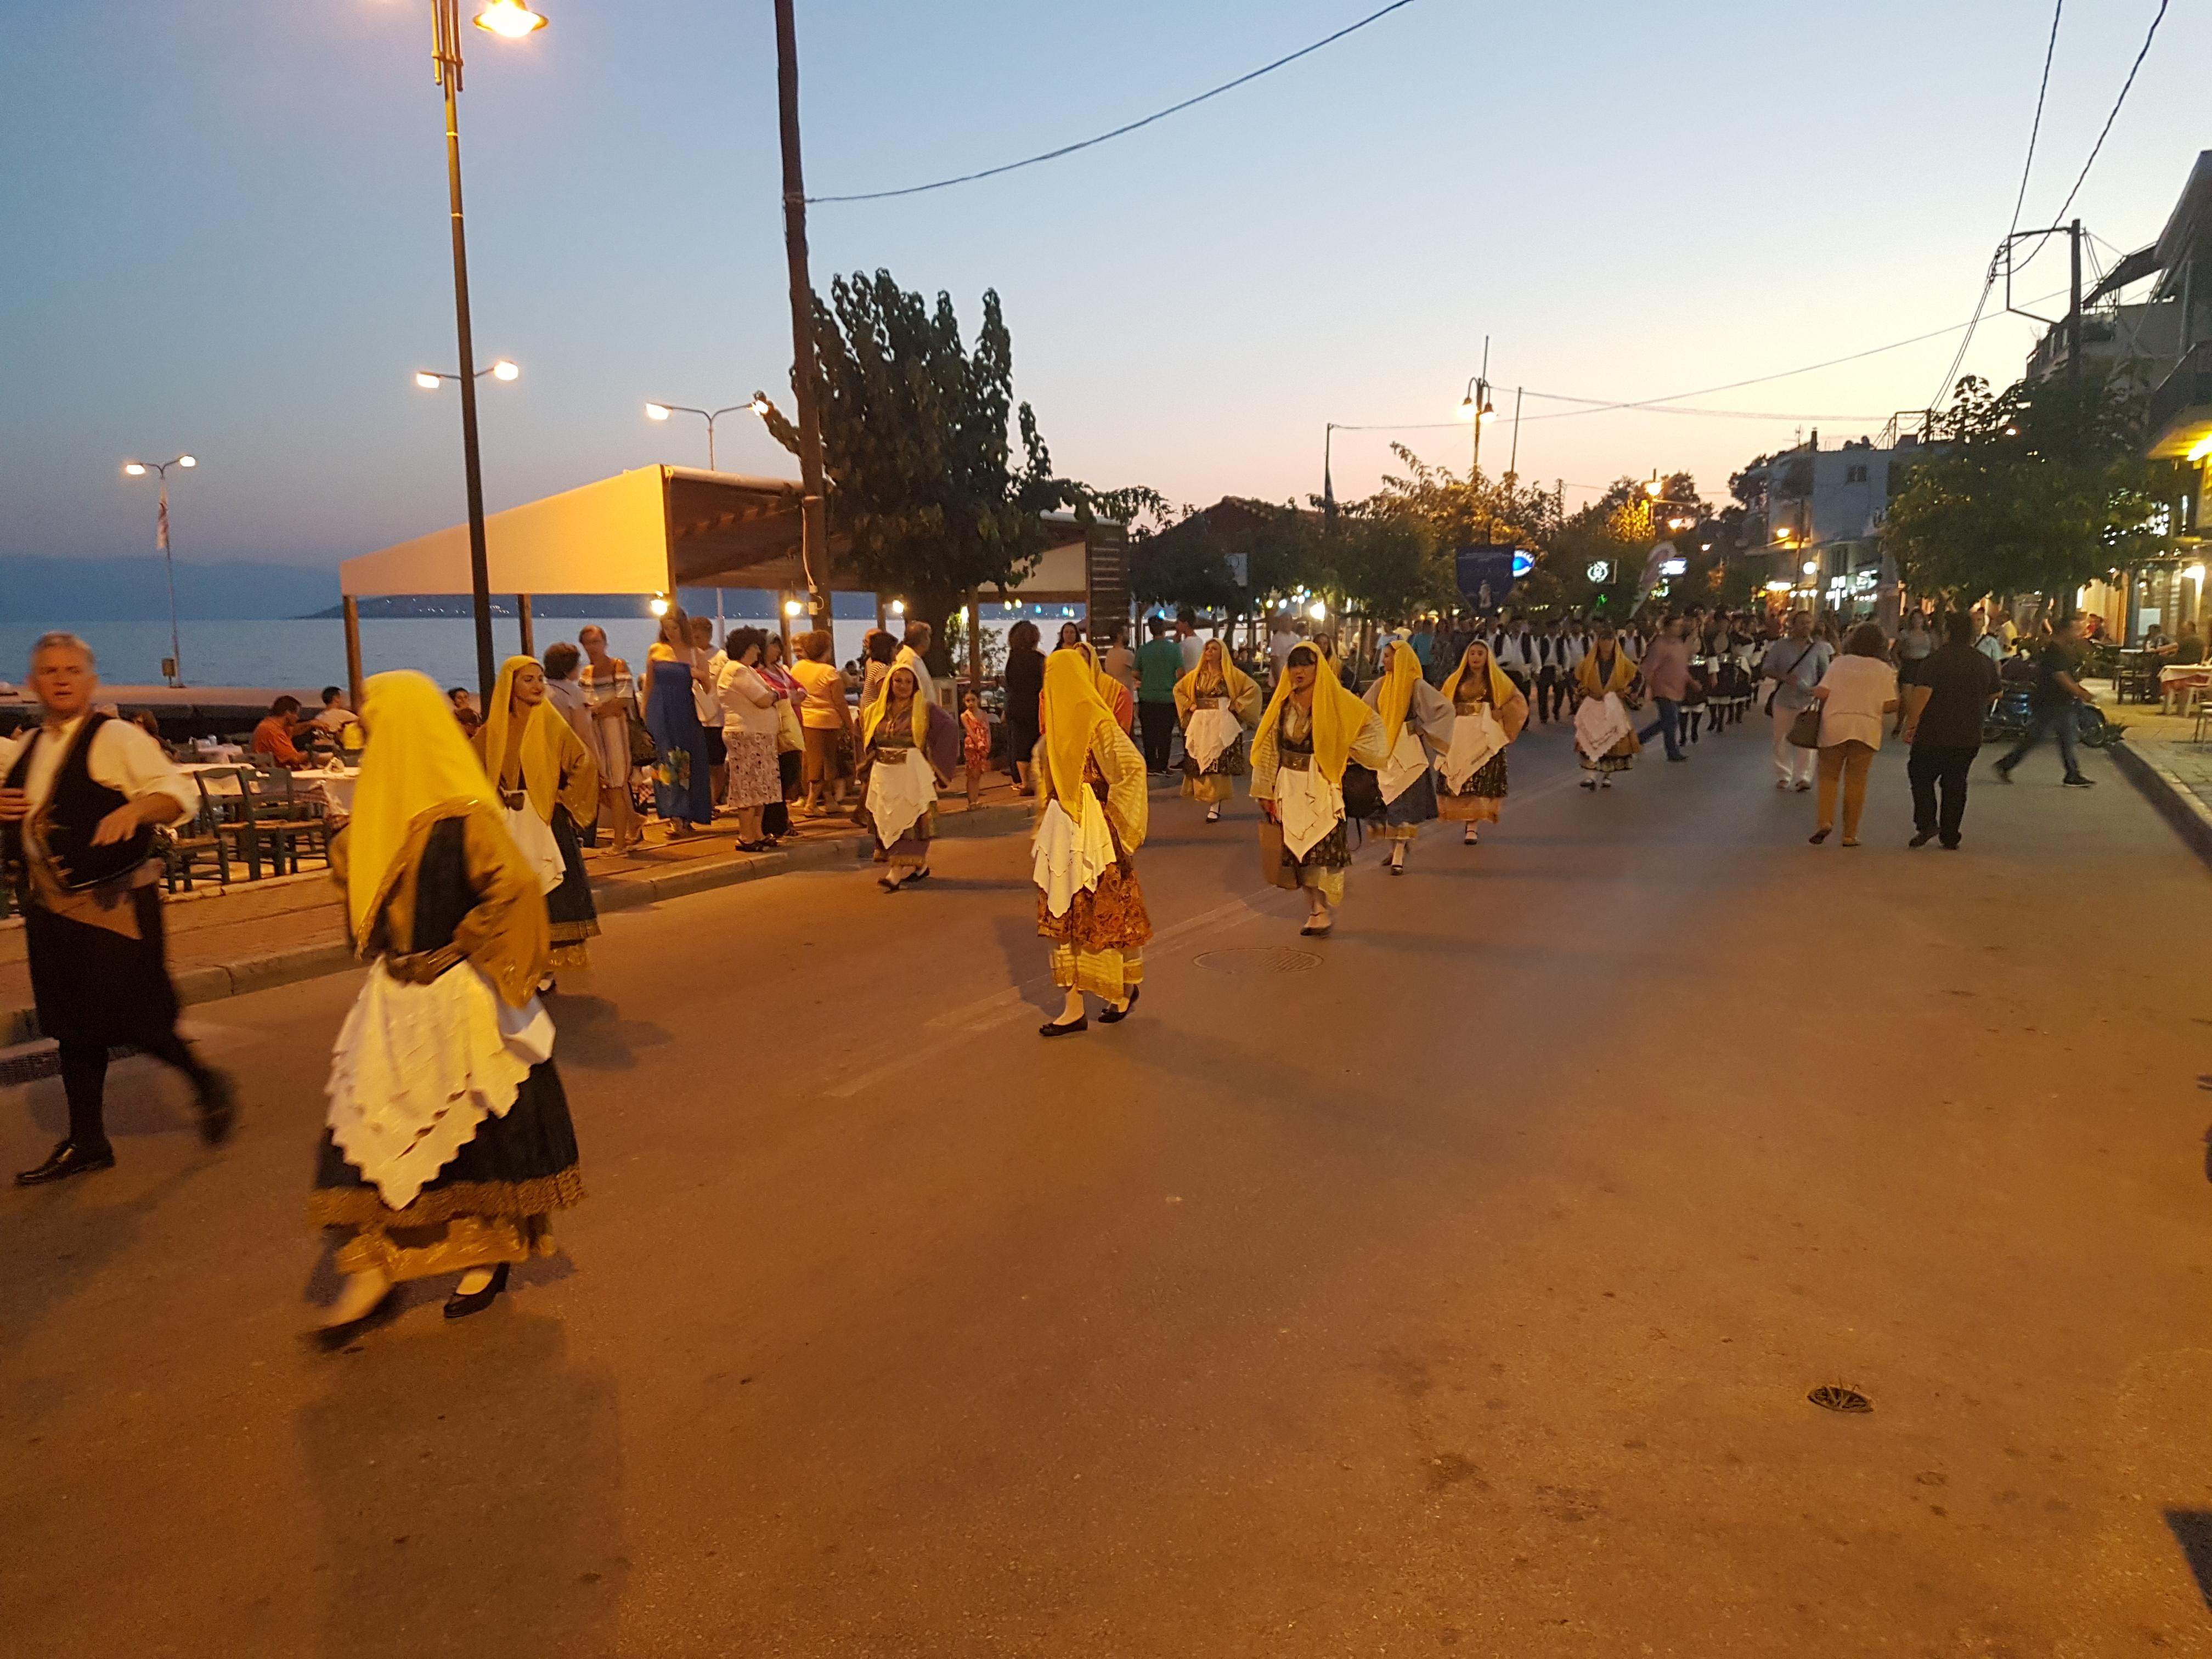 36d56423155 Πραγματοποιήθηκε χθες το φεστιβάλ παραδοσιακών χορών στην Αγριά στο  θεατράκι του ΟΣΕ, που γέμισε από κόσμο, στο πλαίσιο της Ψαράδικης Βραδιάς.